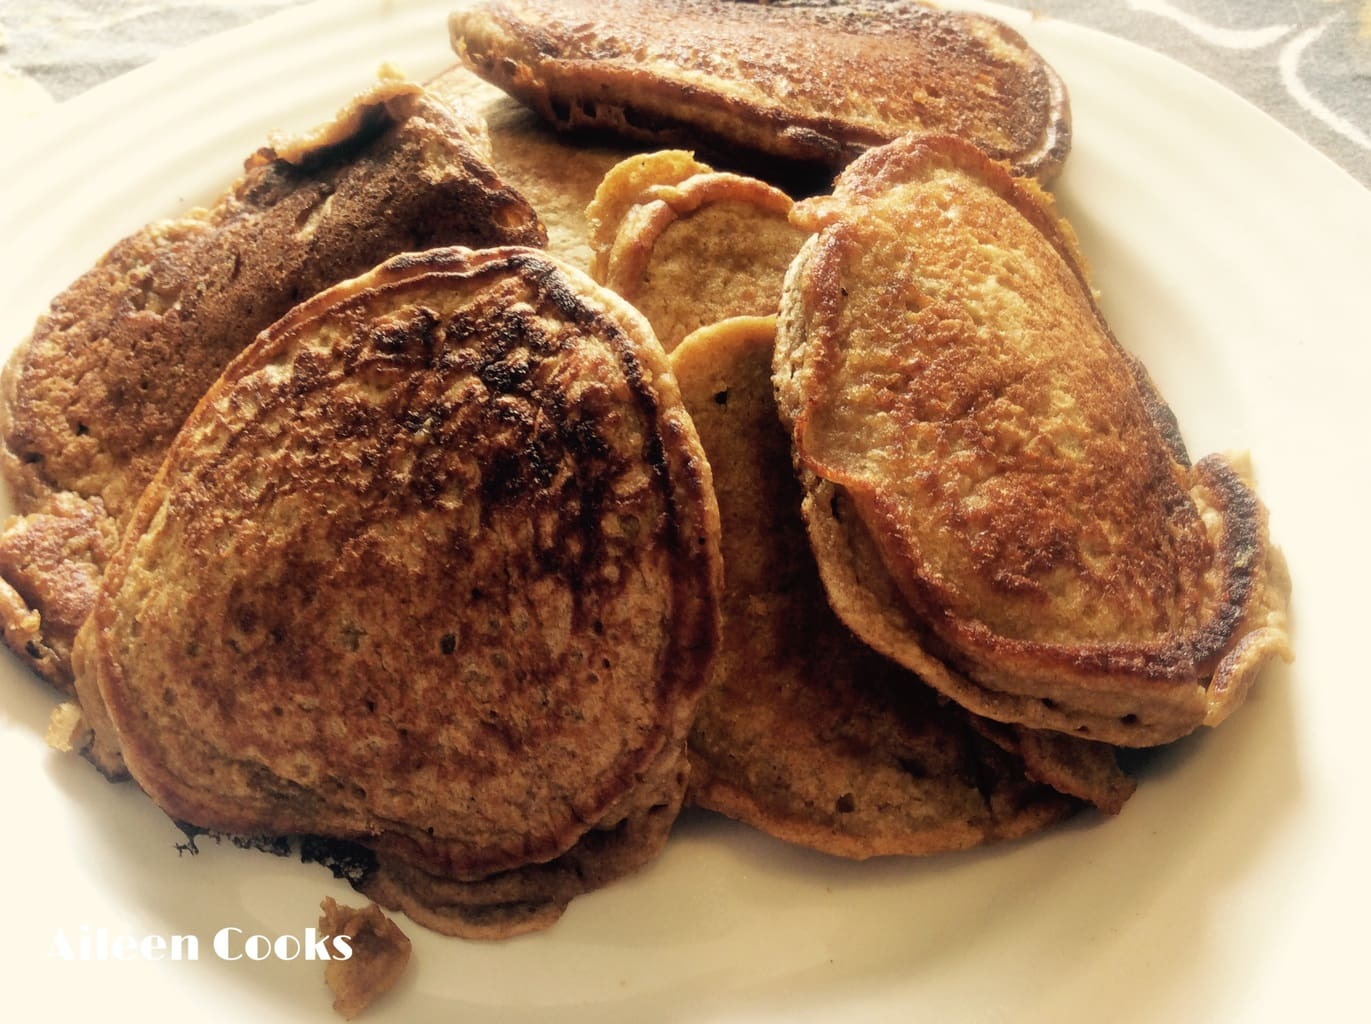 Whole Wheat Pumpkin Pancakes | Aileen Cooks